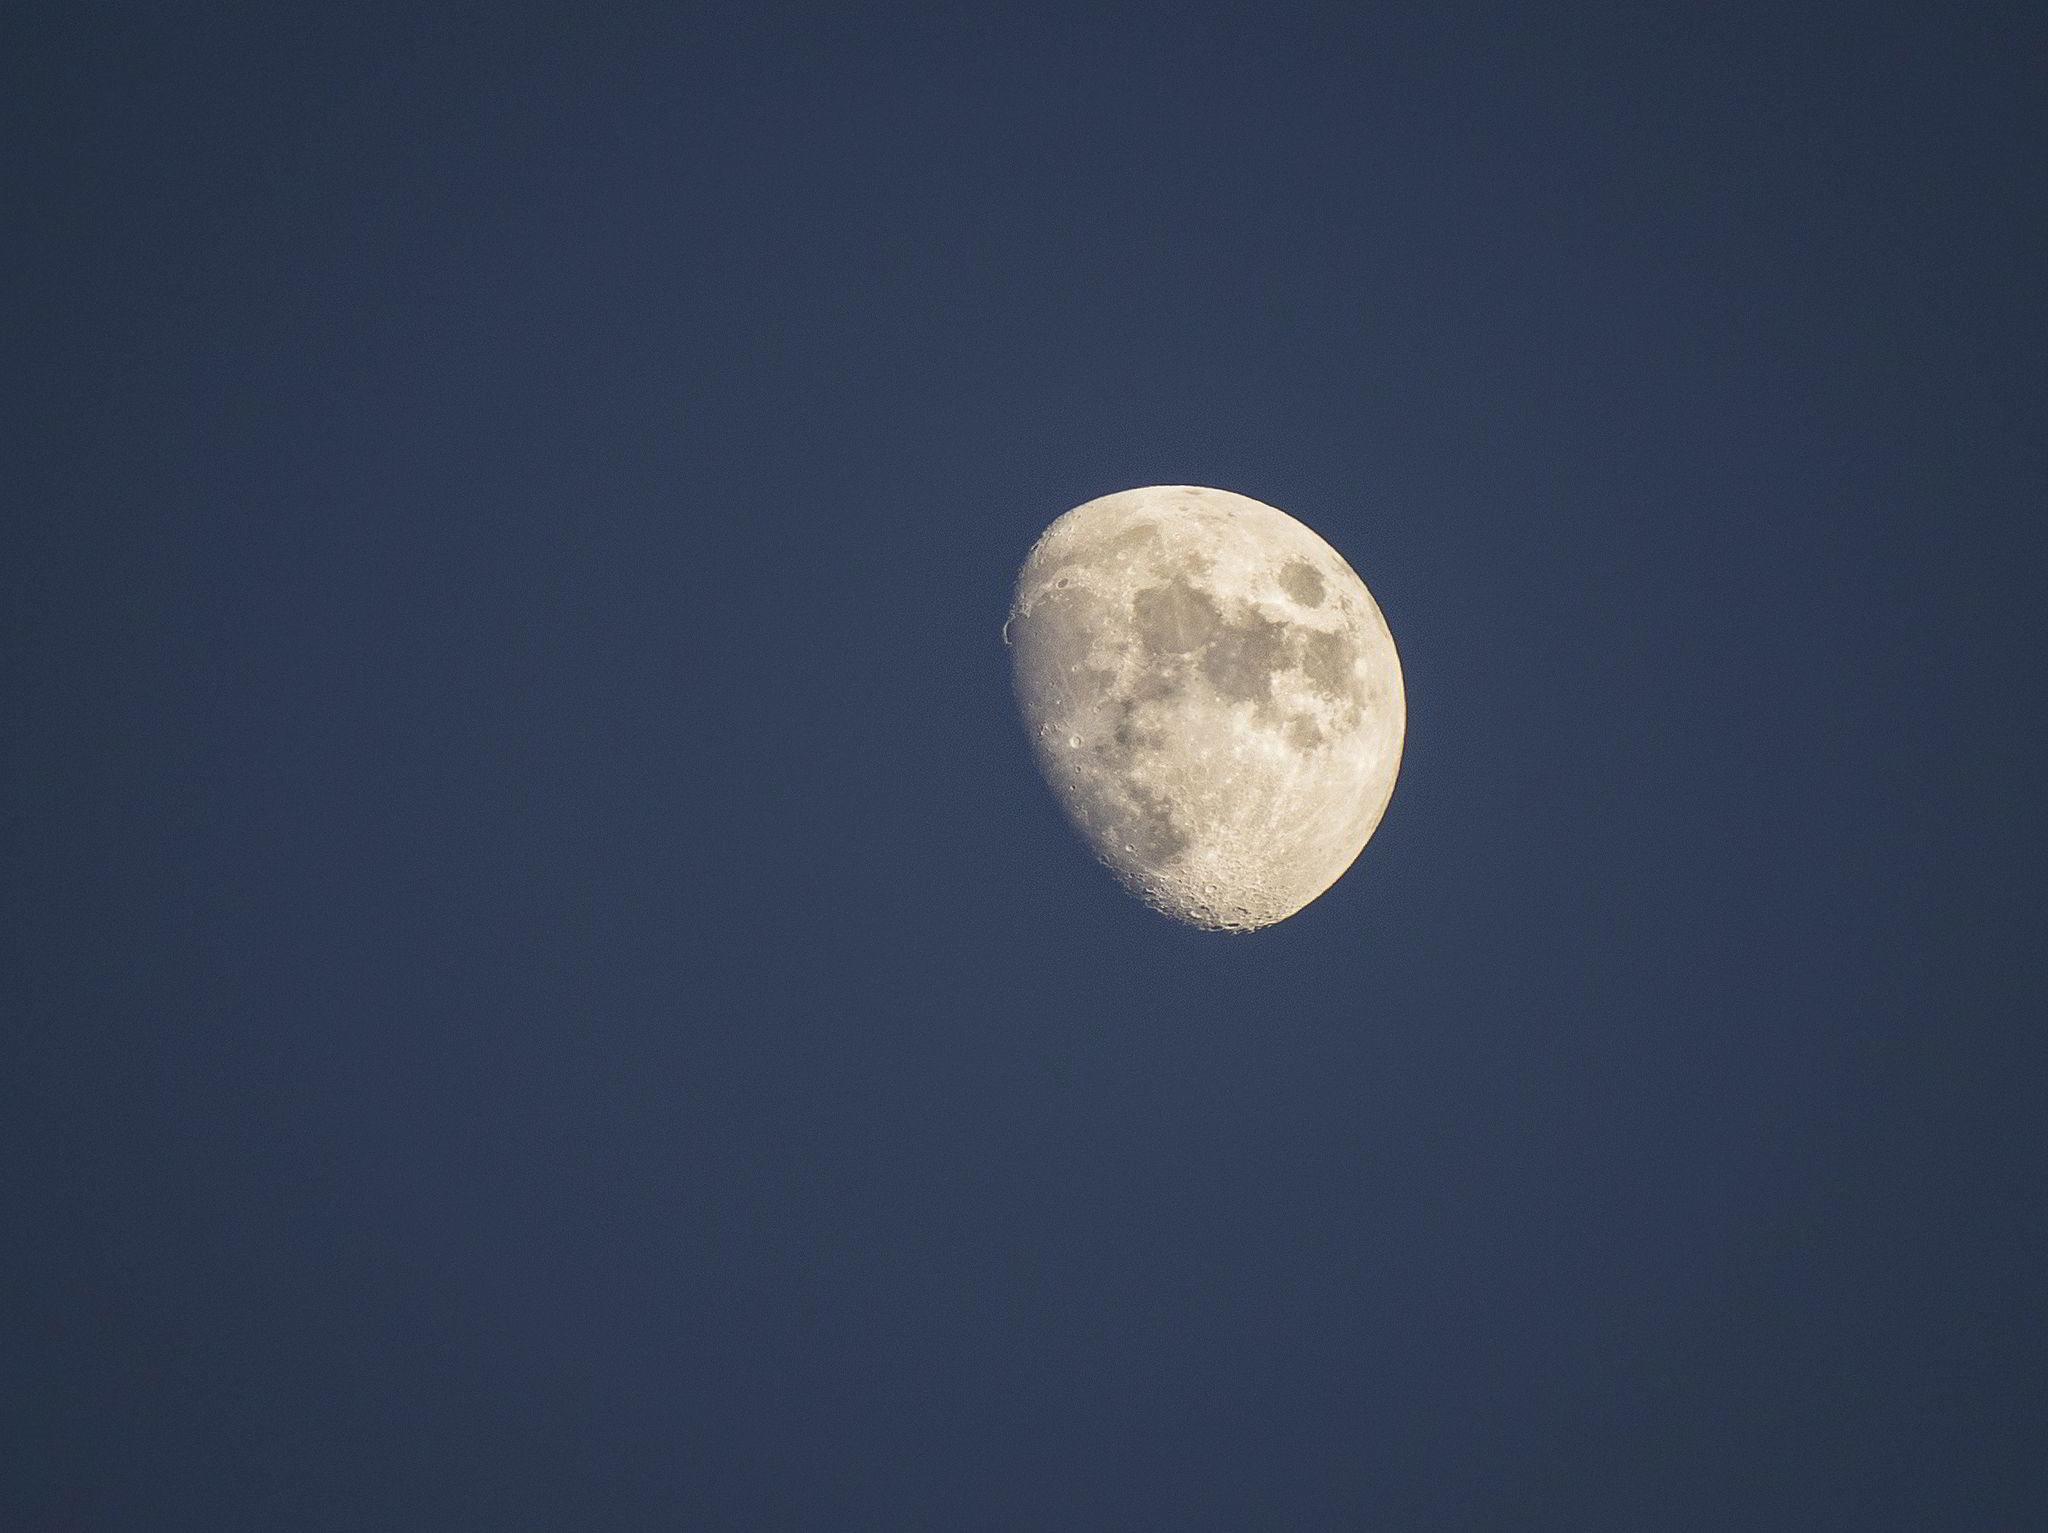 Проведение ритуалов на растущей луне